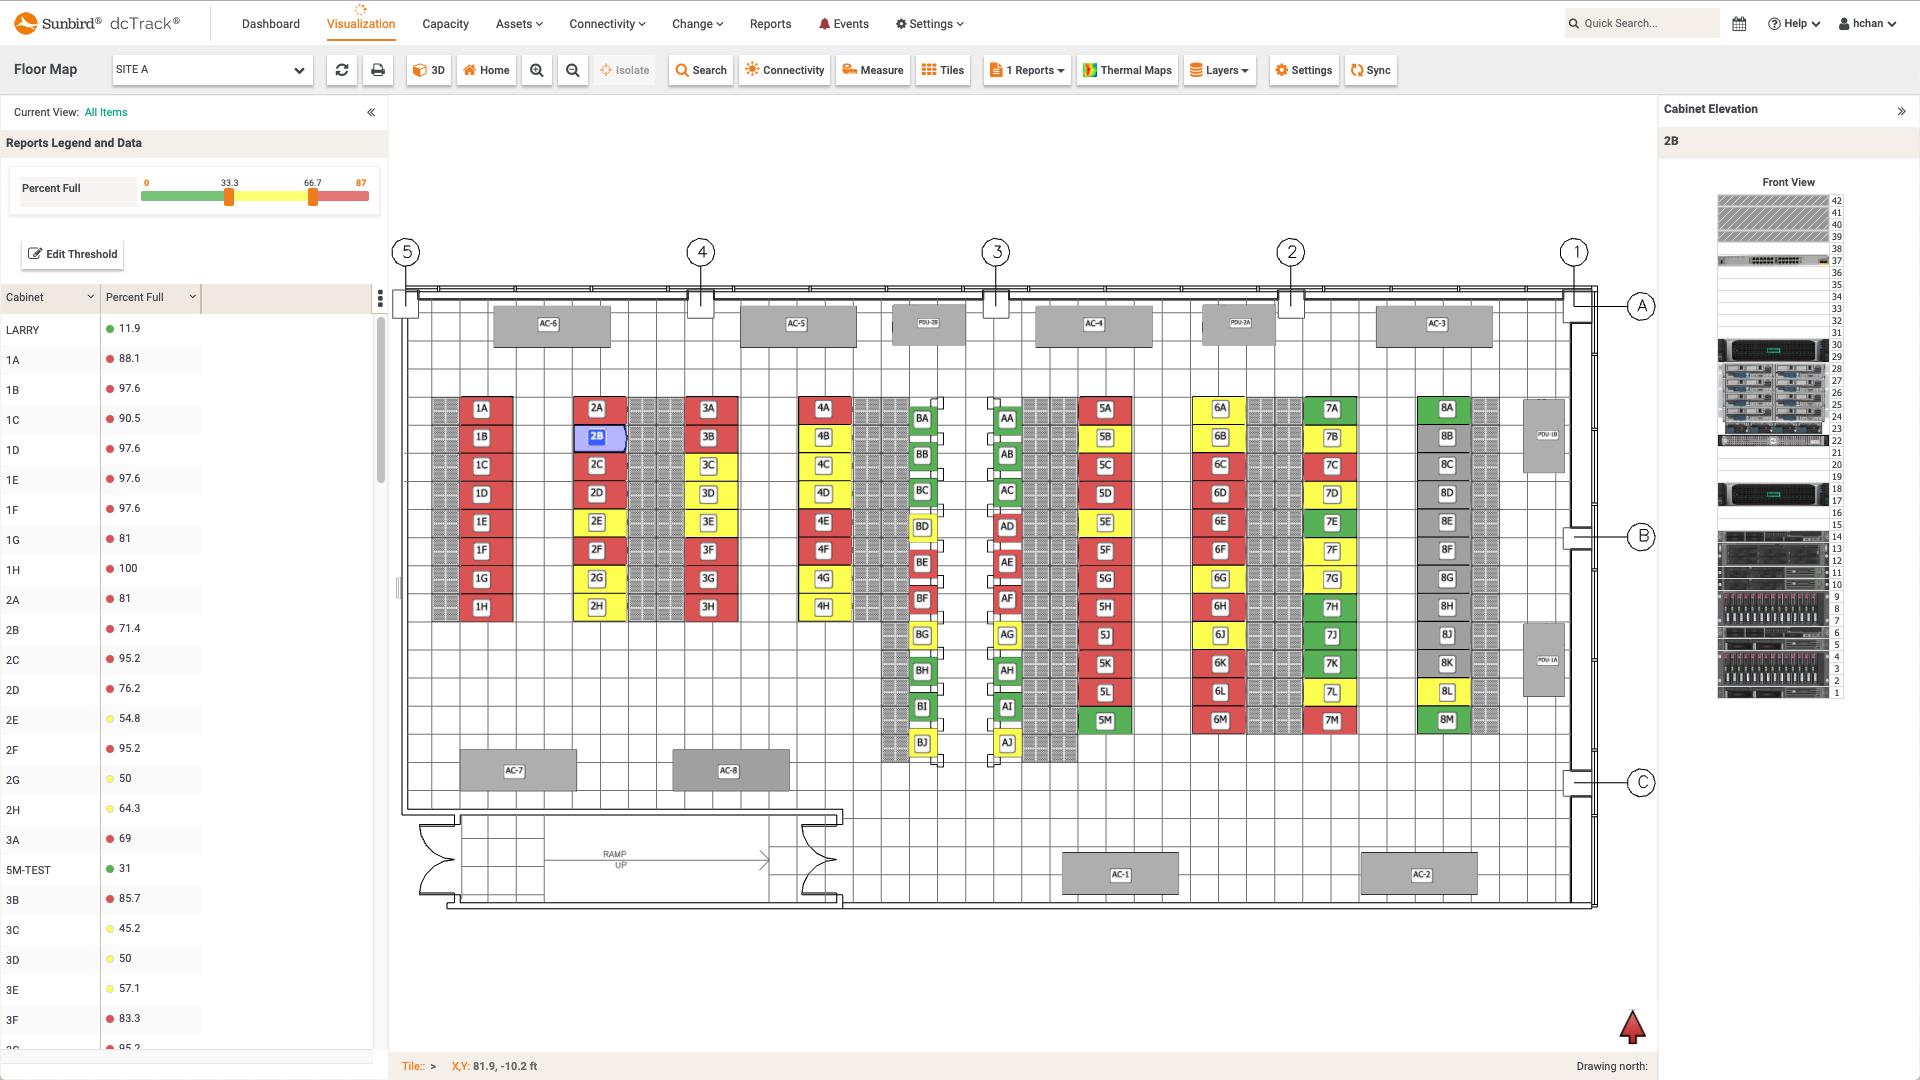 Screenshot of Percent Full per Cabinet Floor Map Report